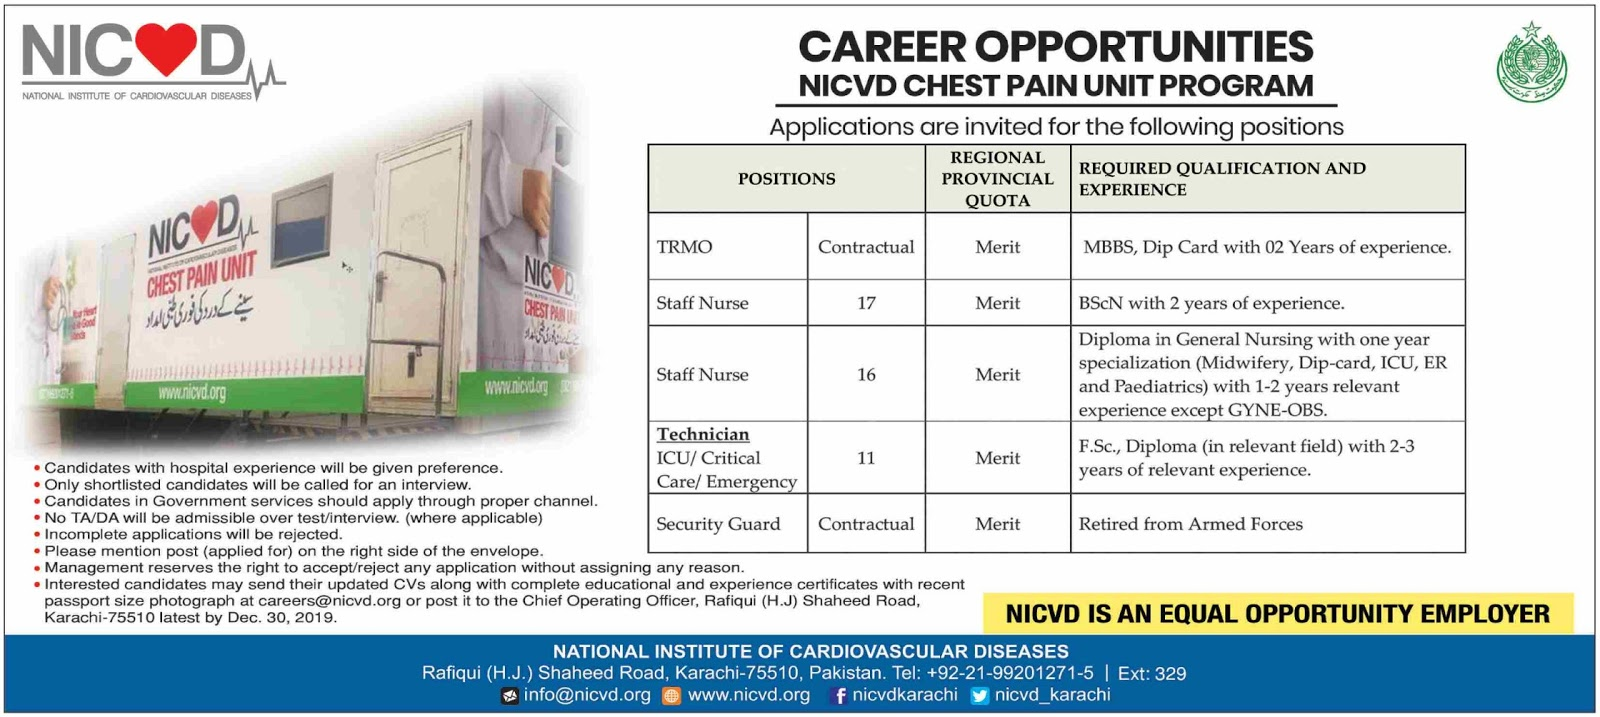 NICVD Chest Pain Unit Program Jobs 2019 Karachi Latest